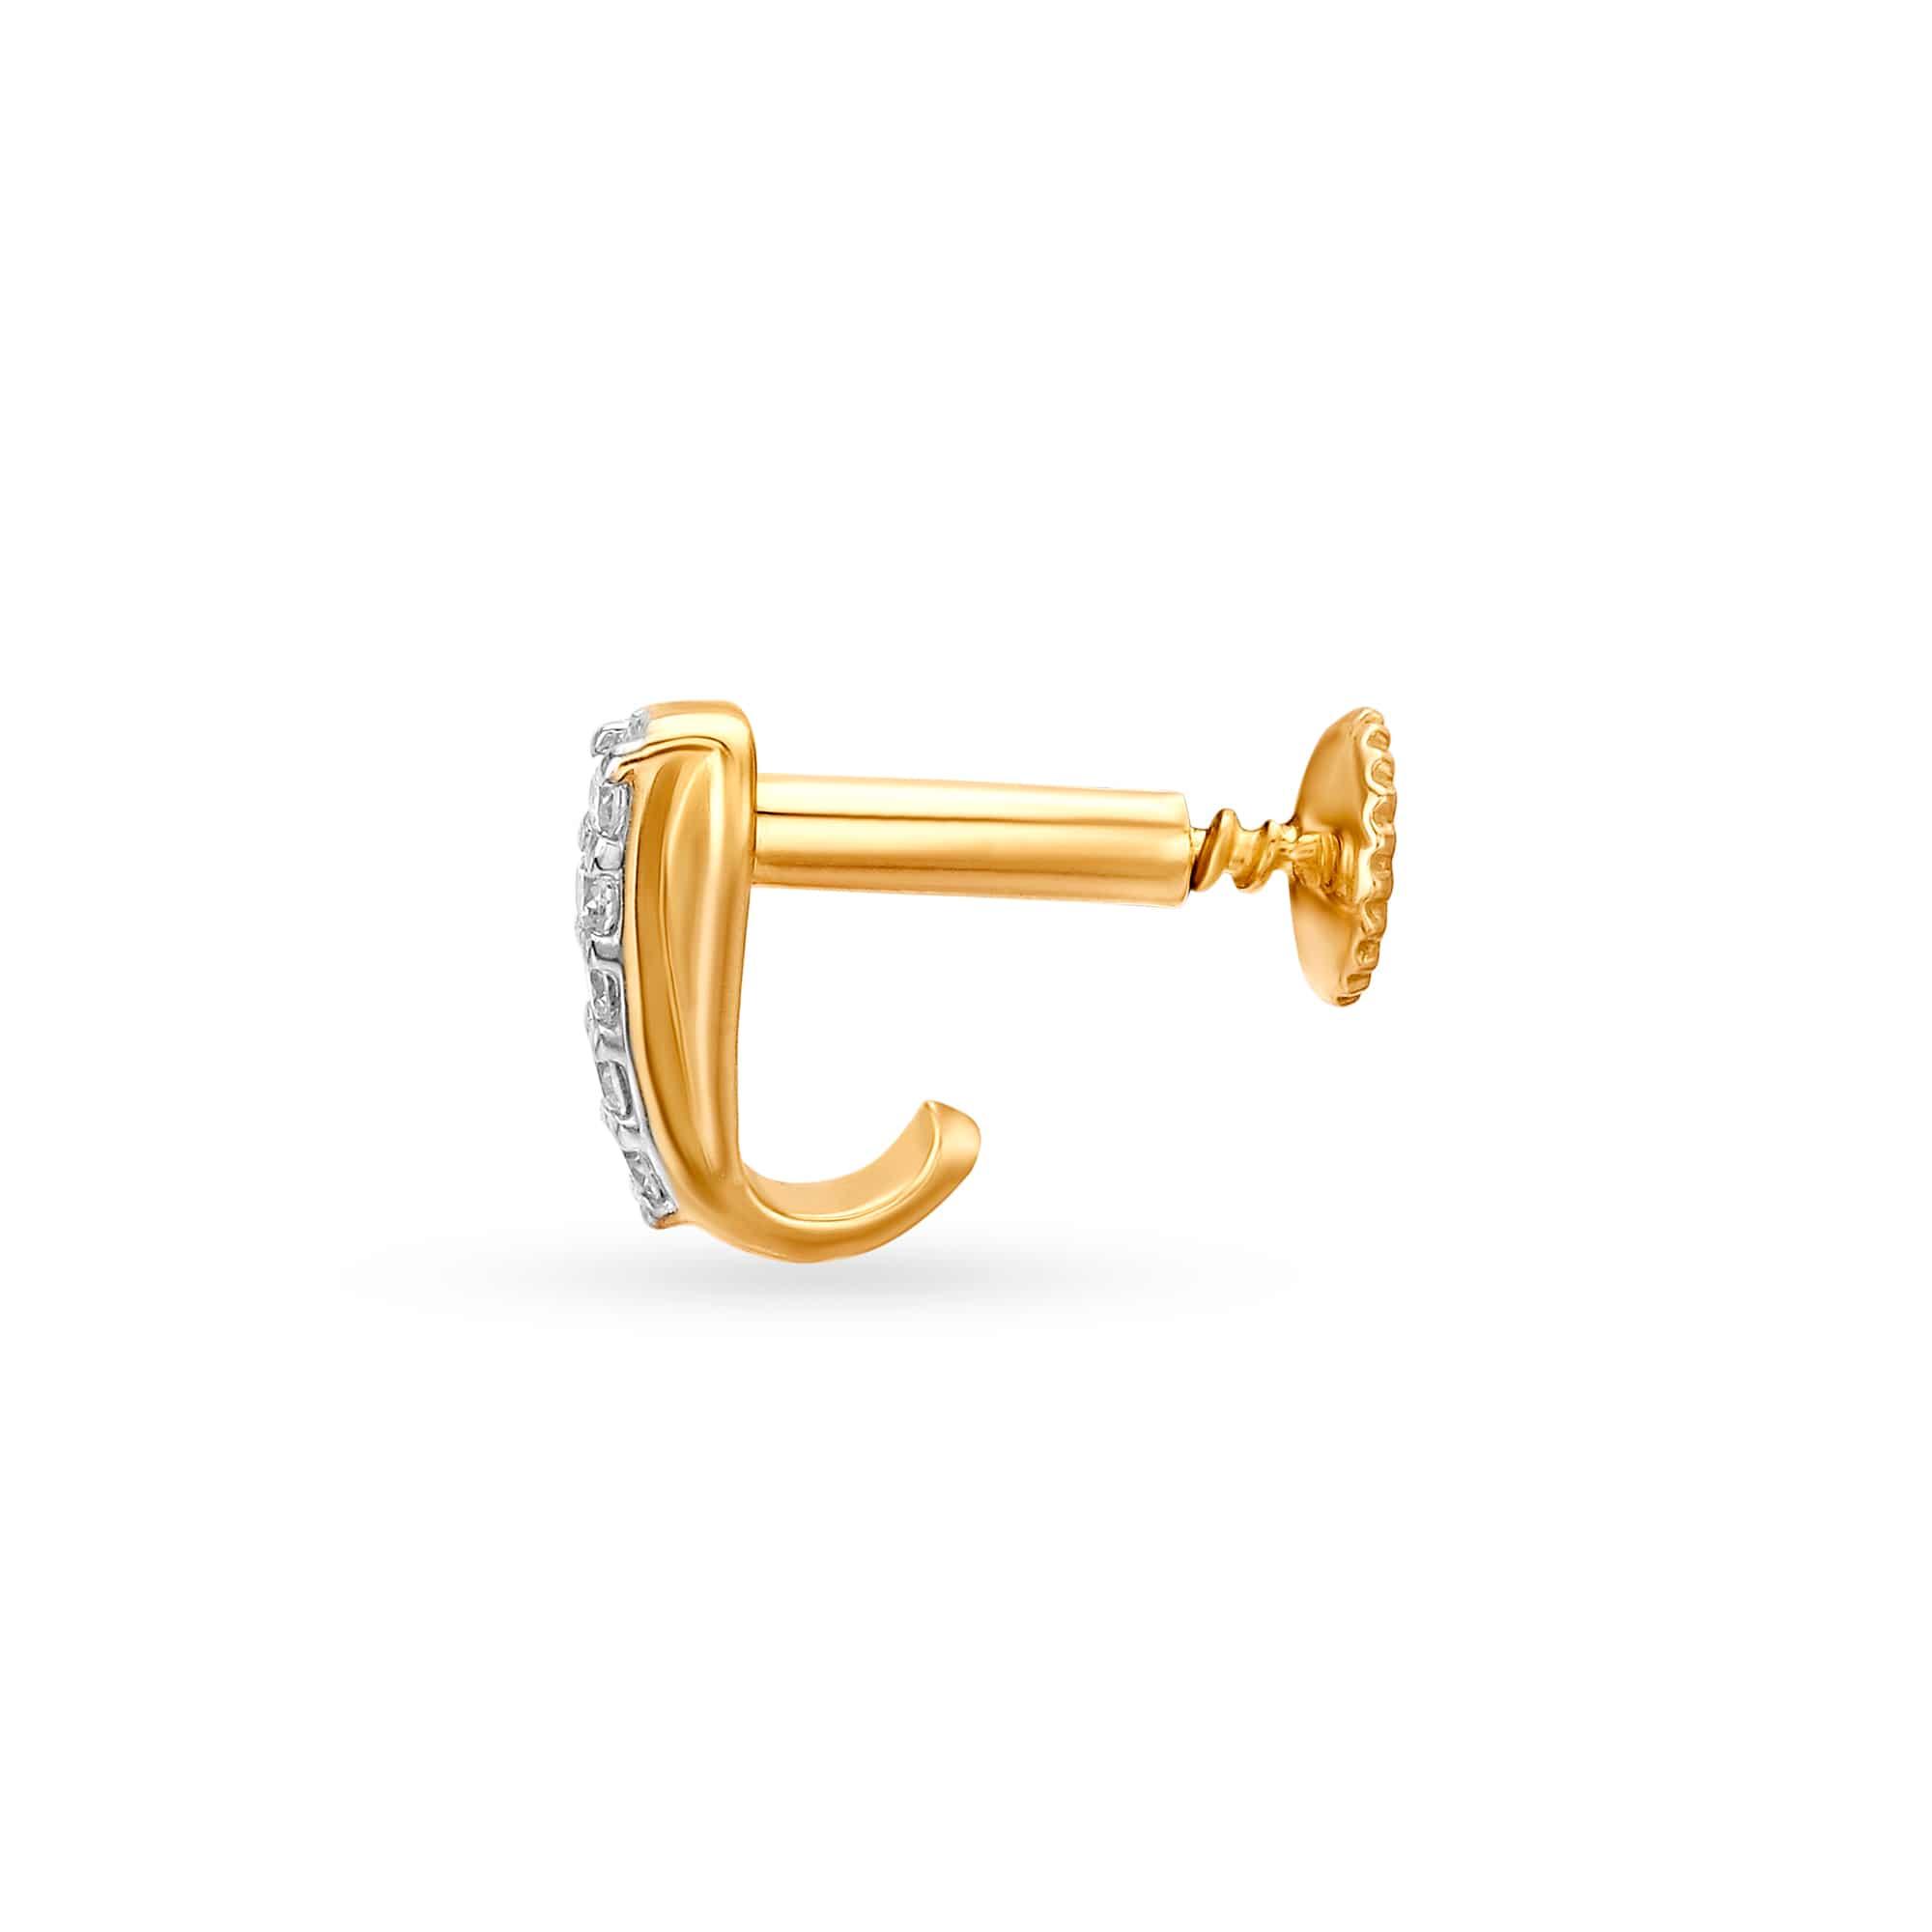 Mia By Tanishq 14kt Yellow Gold Diamond Nose Pin Mia